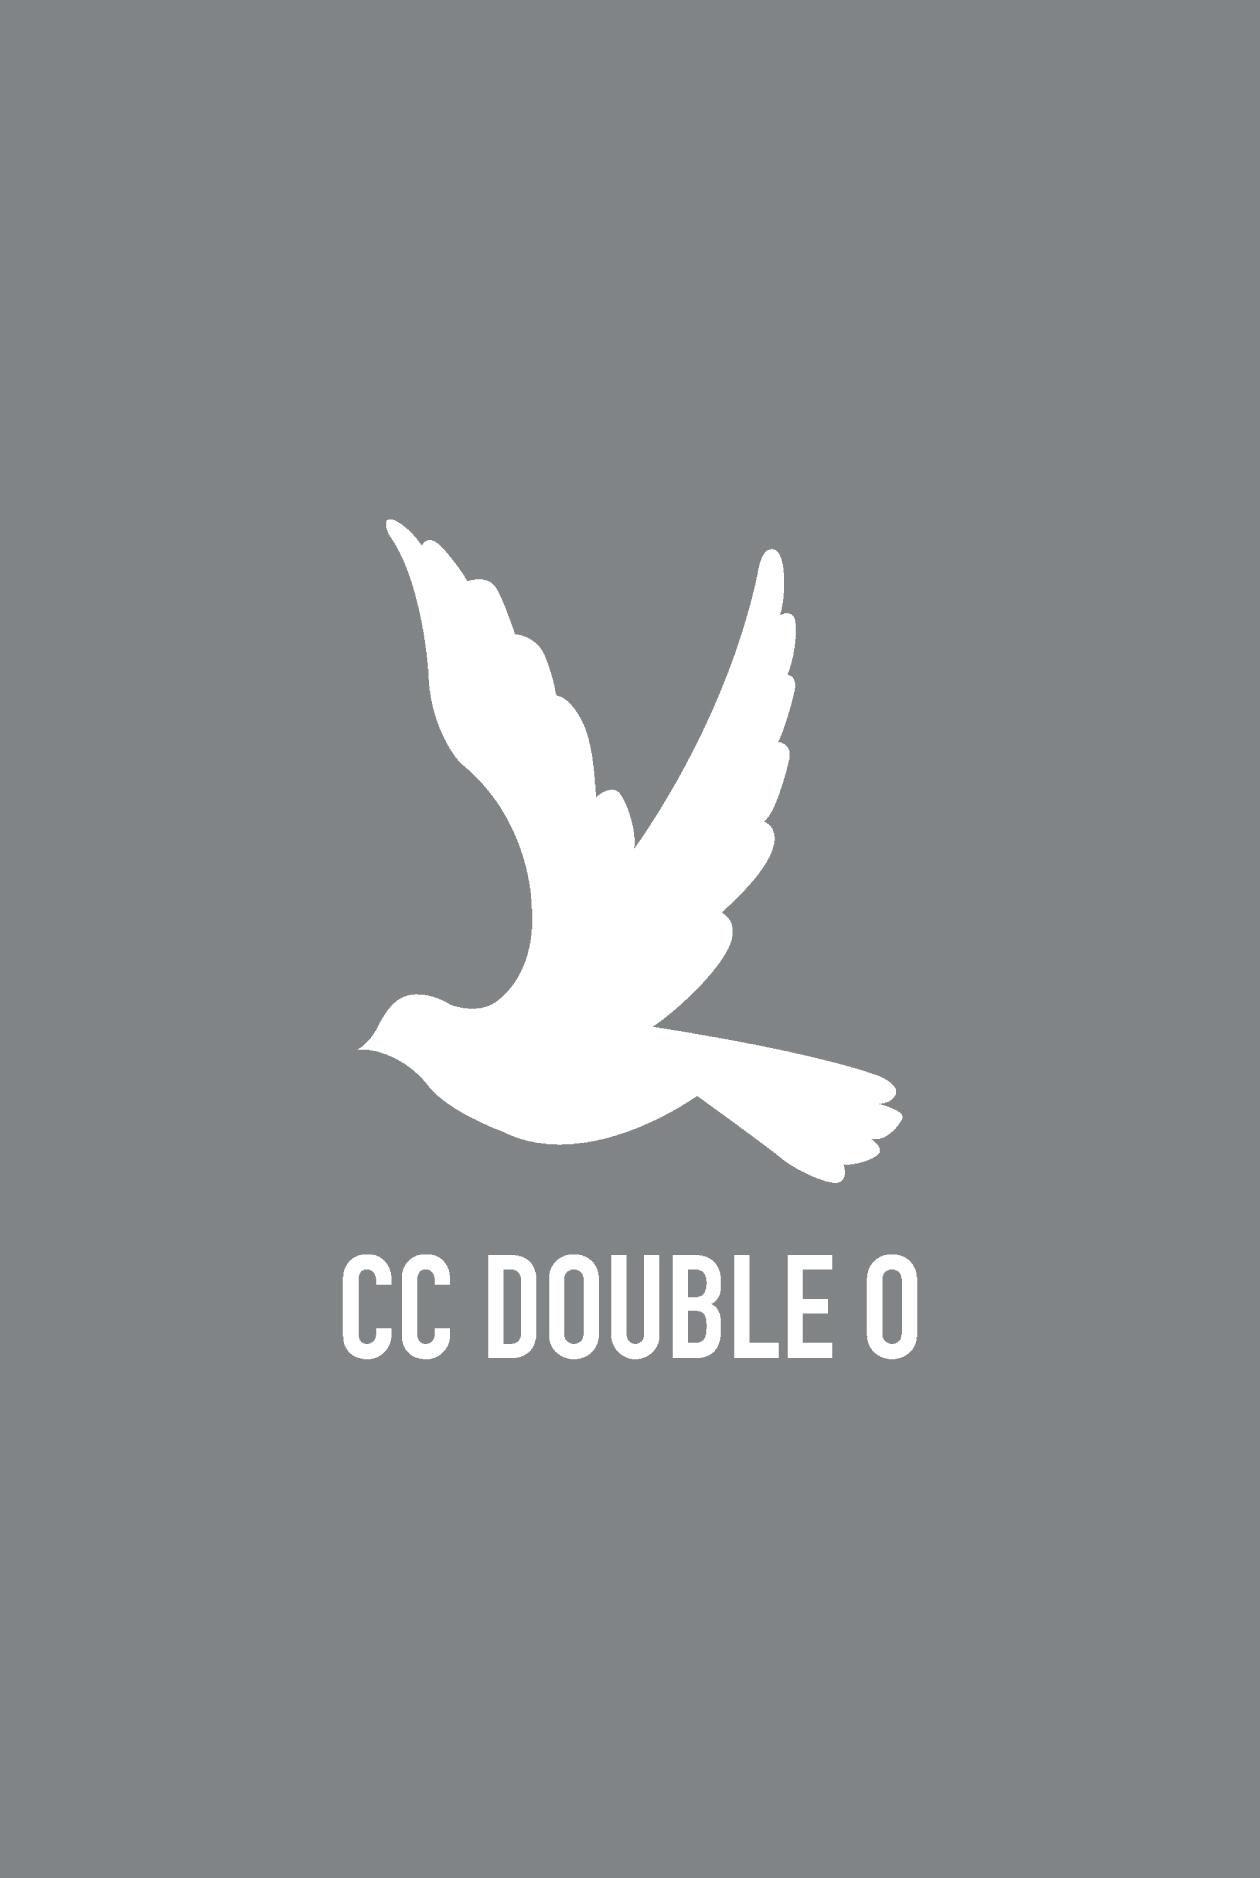 Bird Logo Flag Windbreaker Hoodie Jacket